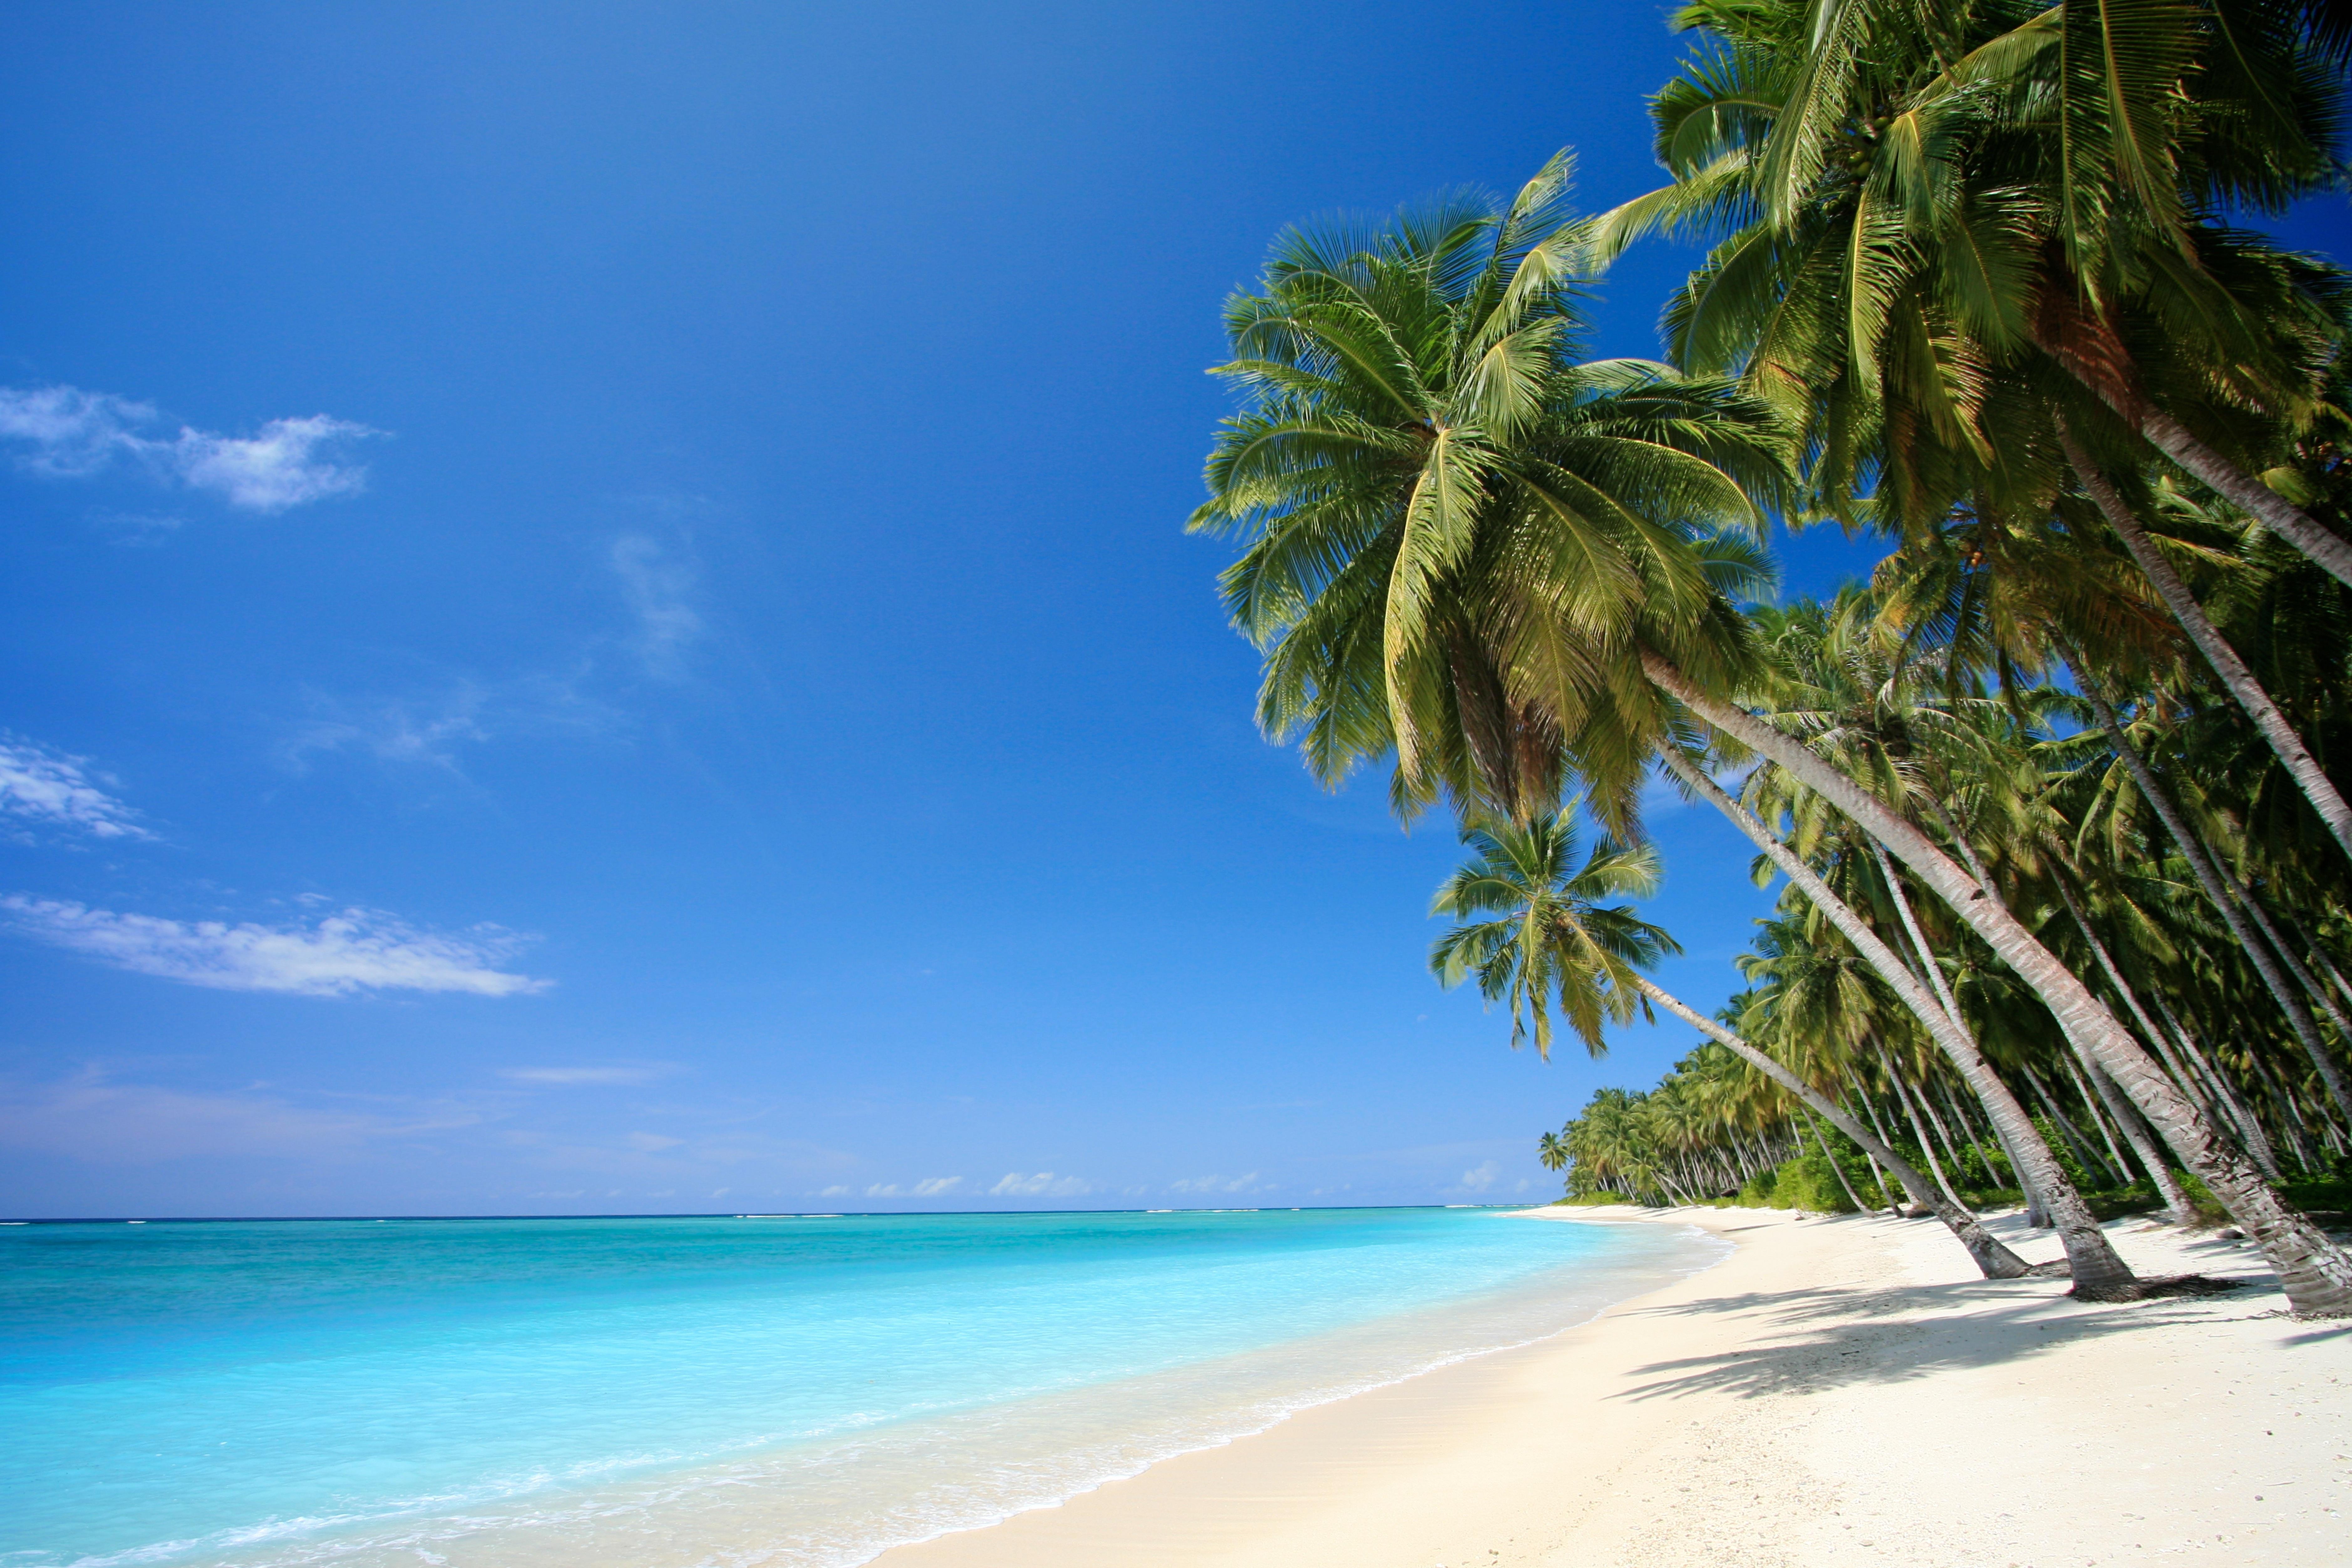 beach theme screensavers beach themes screensavers beach 7512x5008